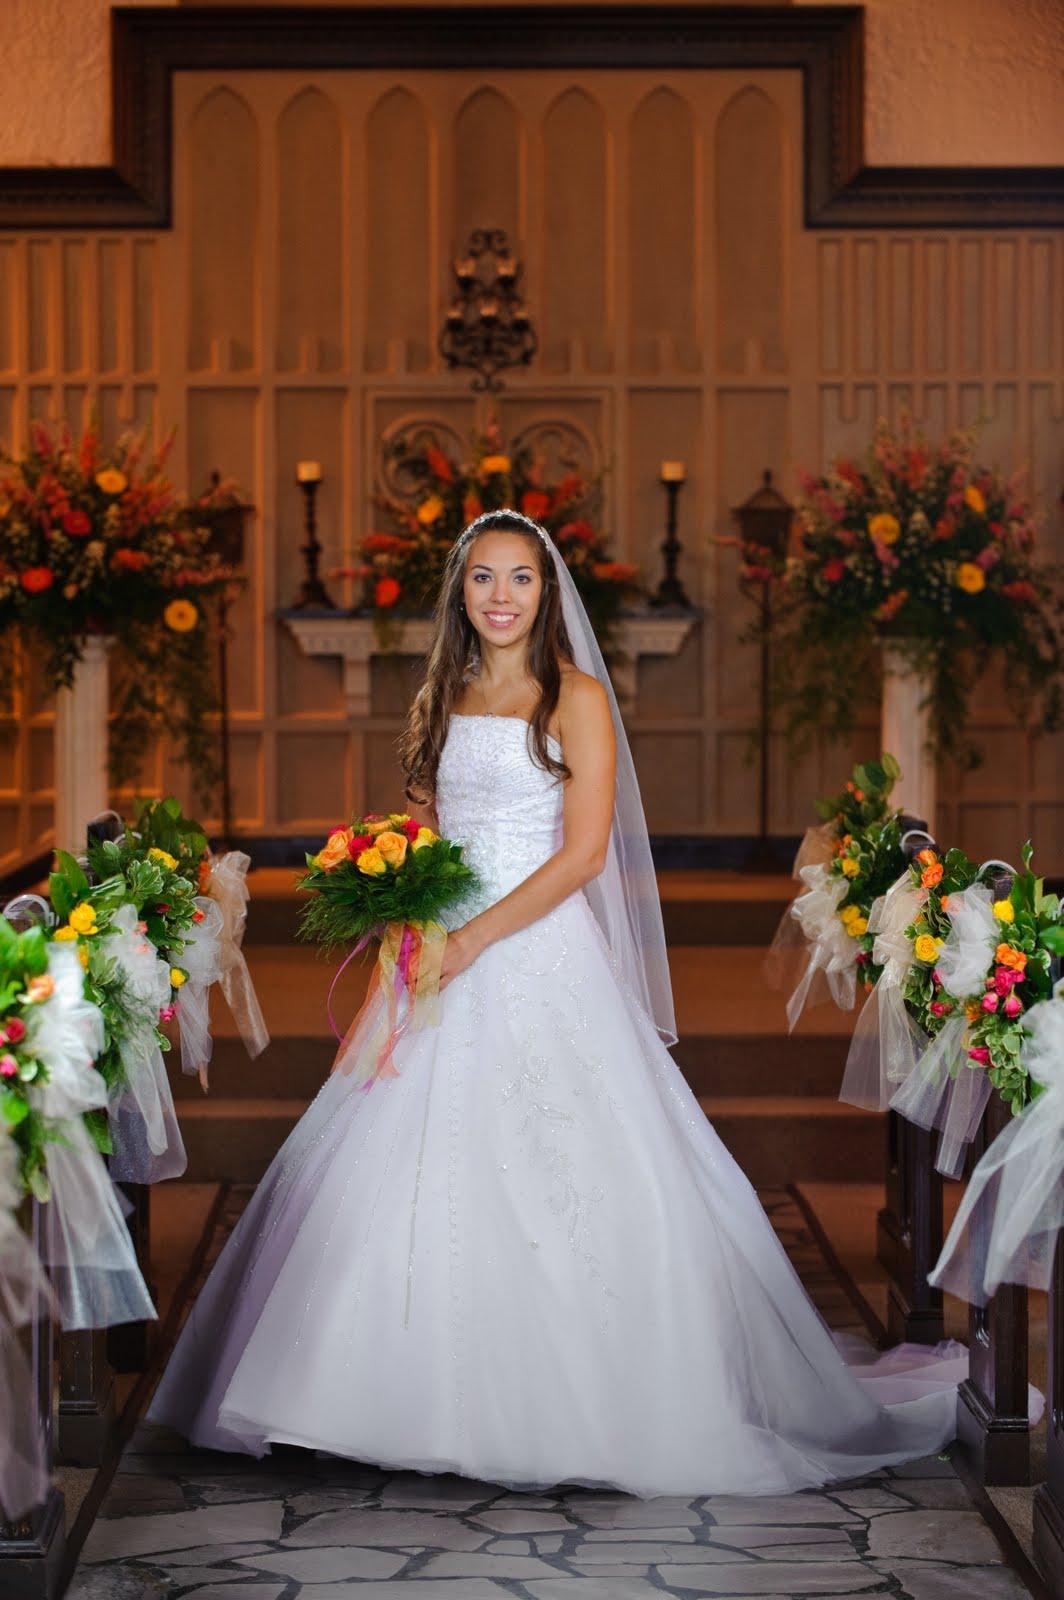 Cable Photography & Video: Erin Beeler & Jeremiah Clark - Wedding ...